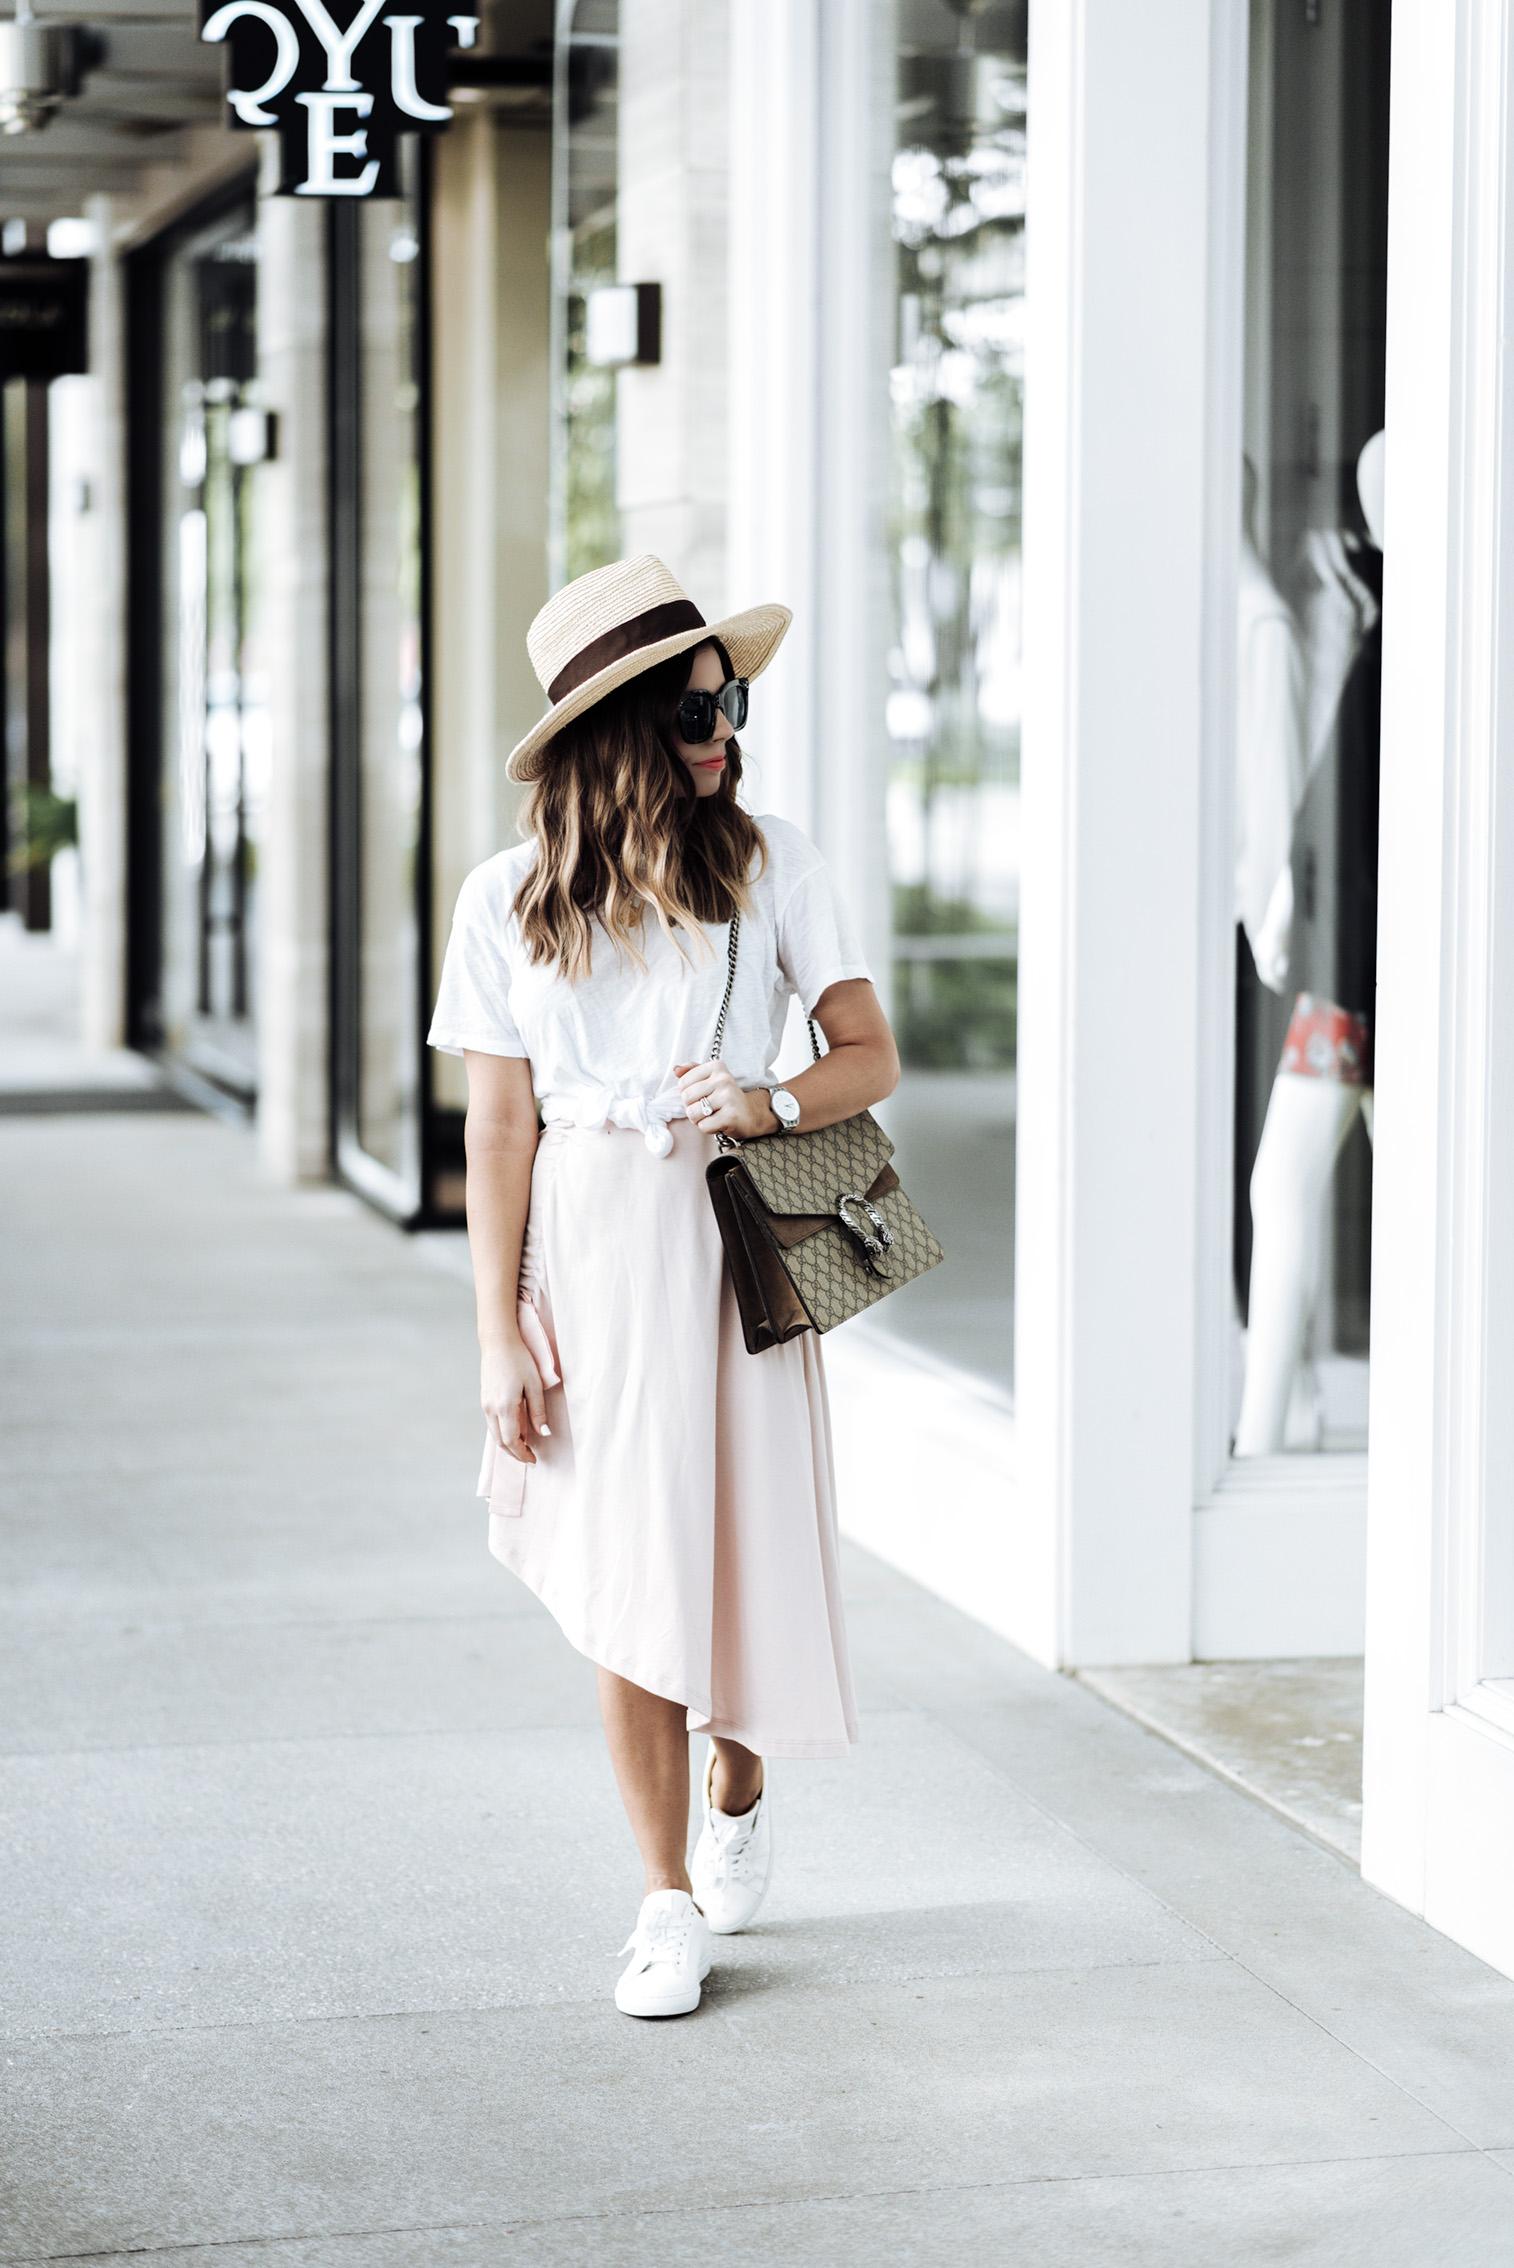 Tiffany Jais Houston fashion and lifestyle blogger | ASOS pink skirt | Cotton crew neck tee | {C/O} Greats sneakers | Gucci Dionysus Bag | Brixton Willow hat | {C/O} Mini Marie Pendant |Streetsyle blogger